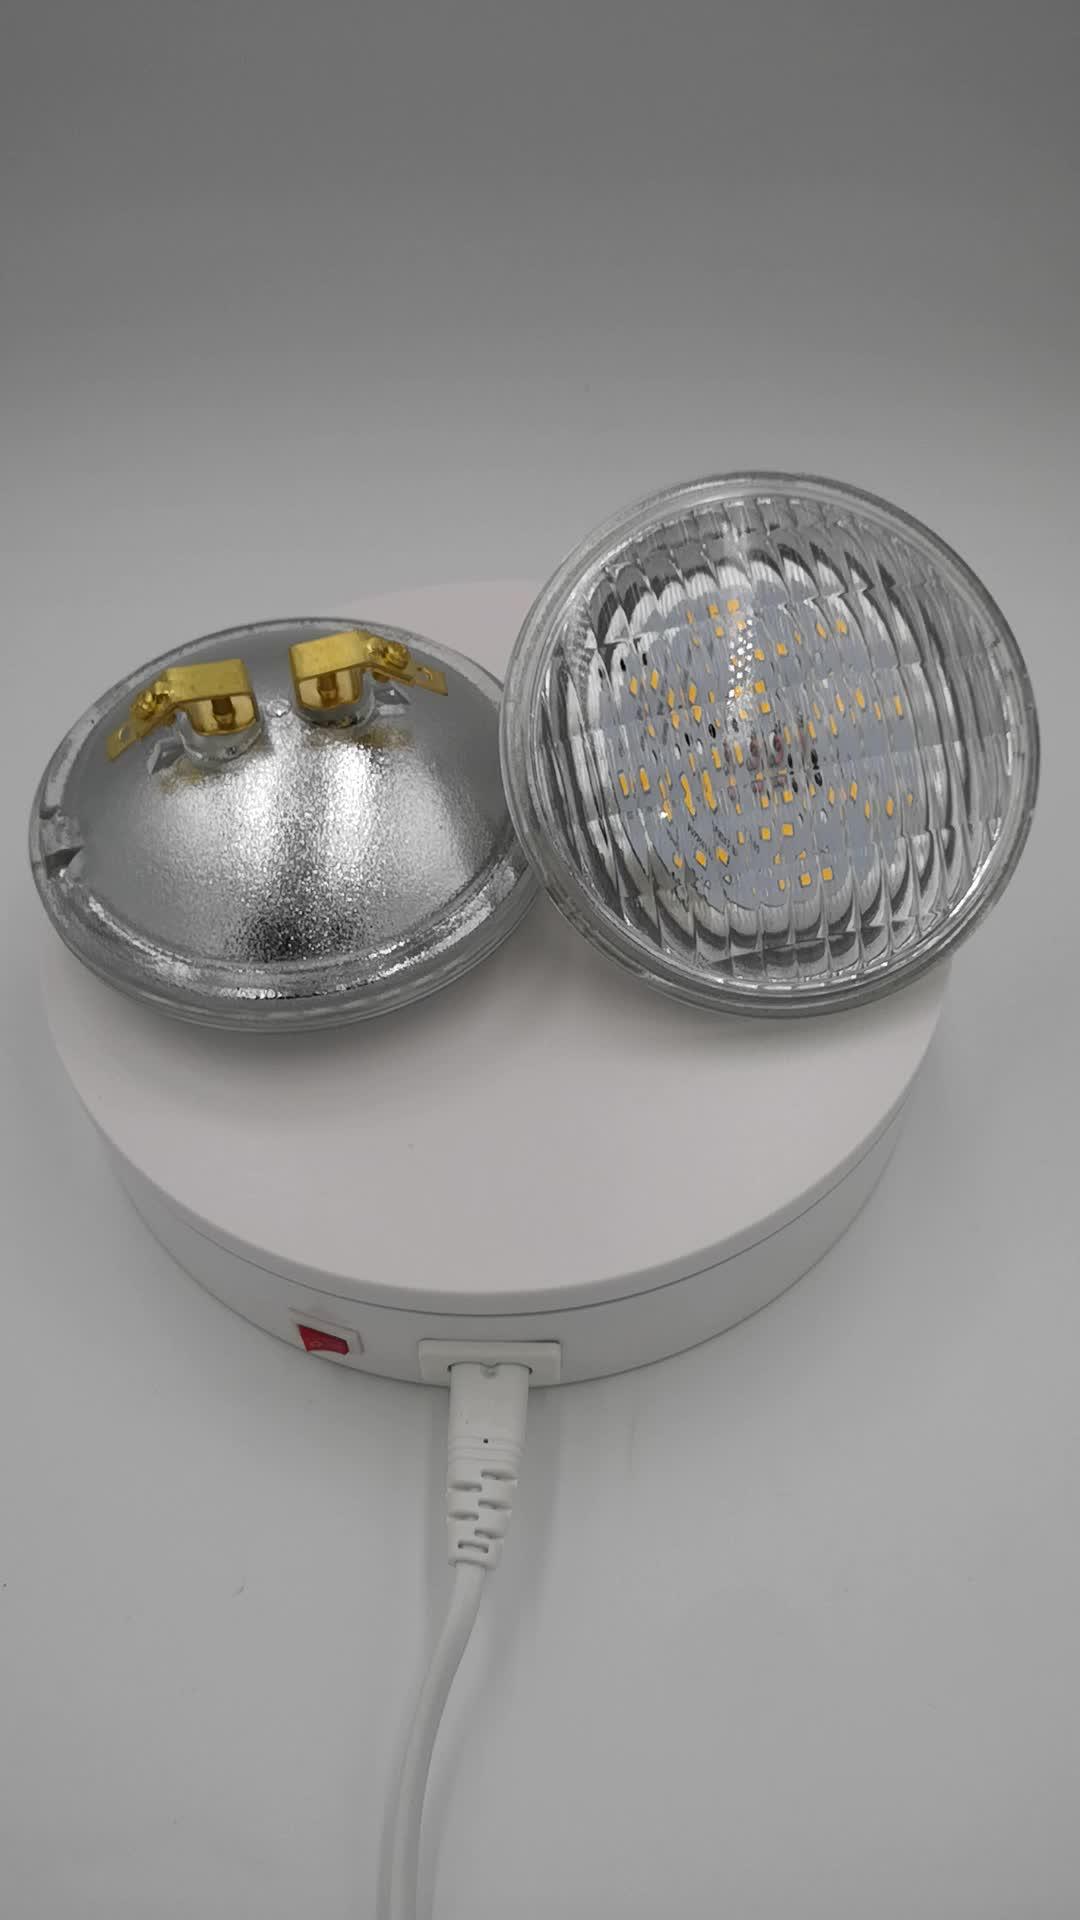 9W SMD2835 LED par 36 lighting led lamp RGB